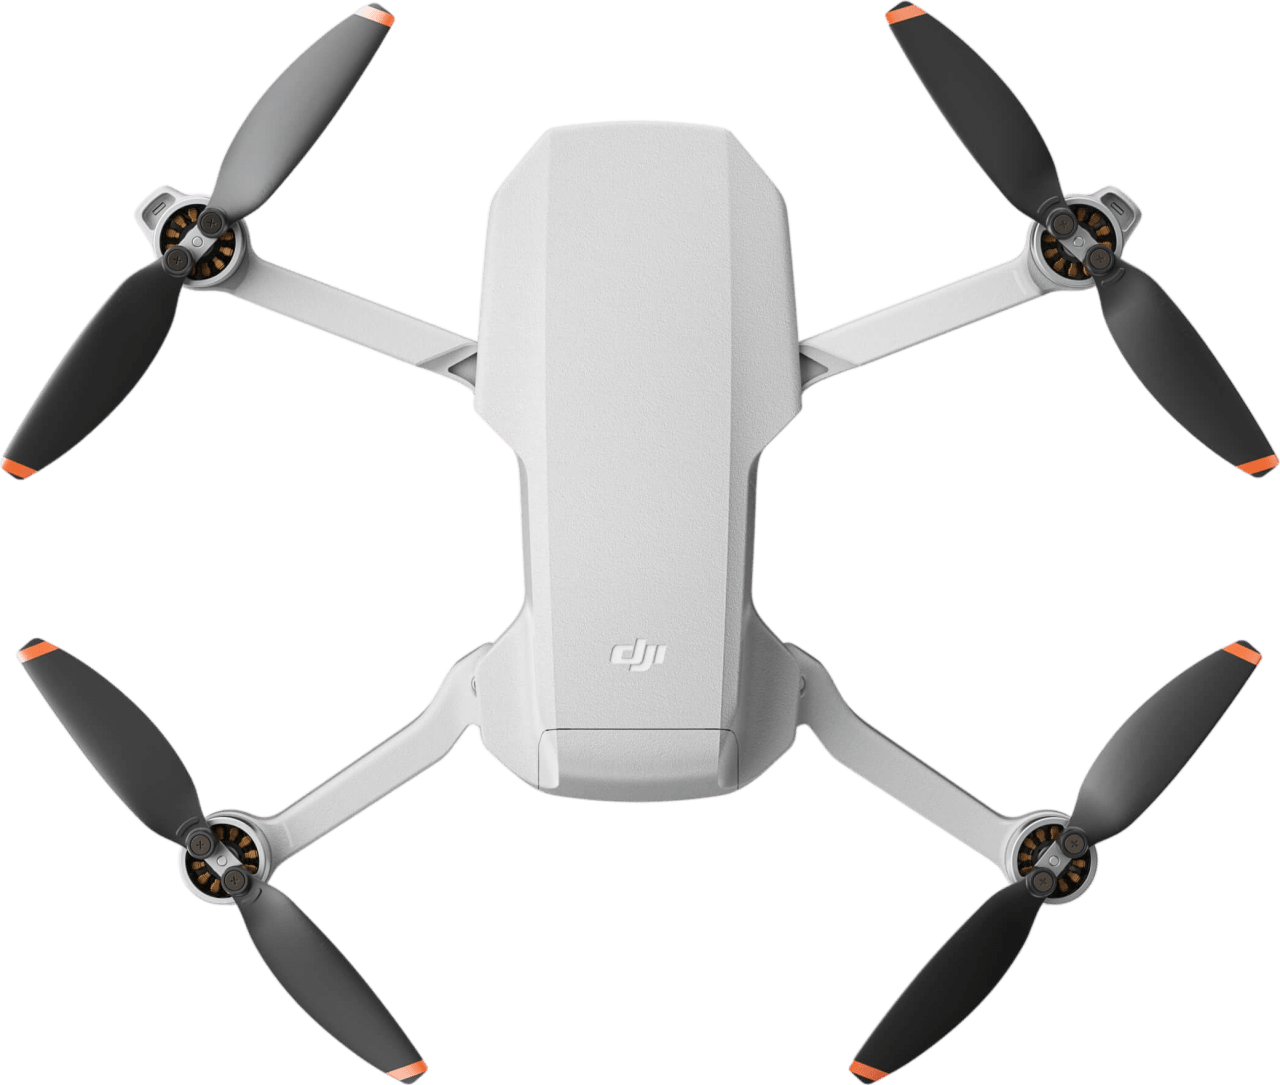 Light Gray DJI Mini 2 Fly More Combo Drone.4